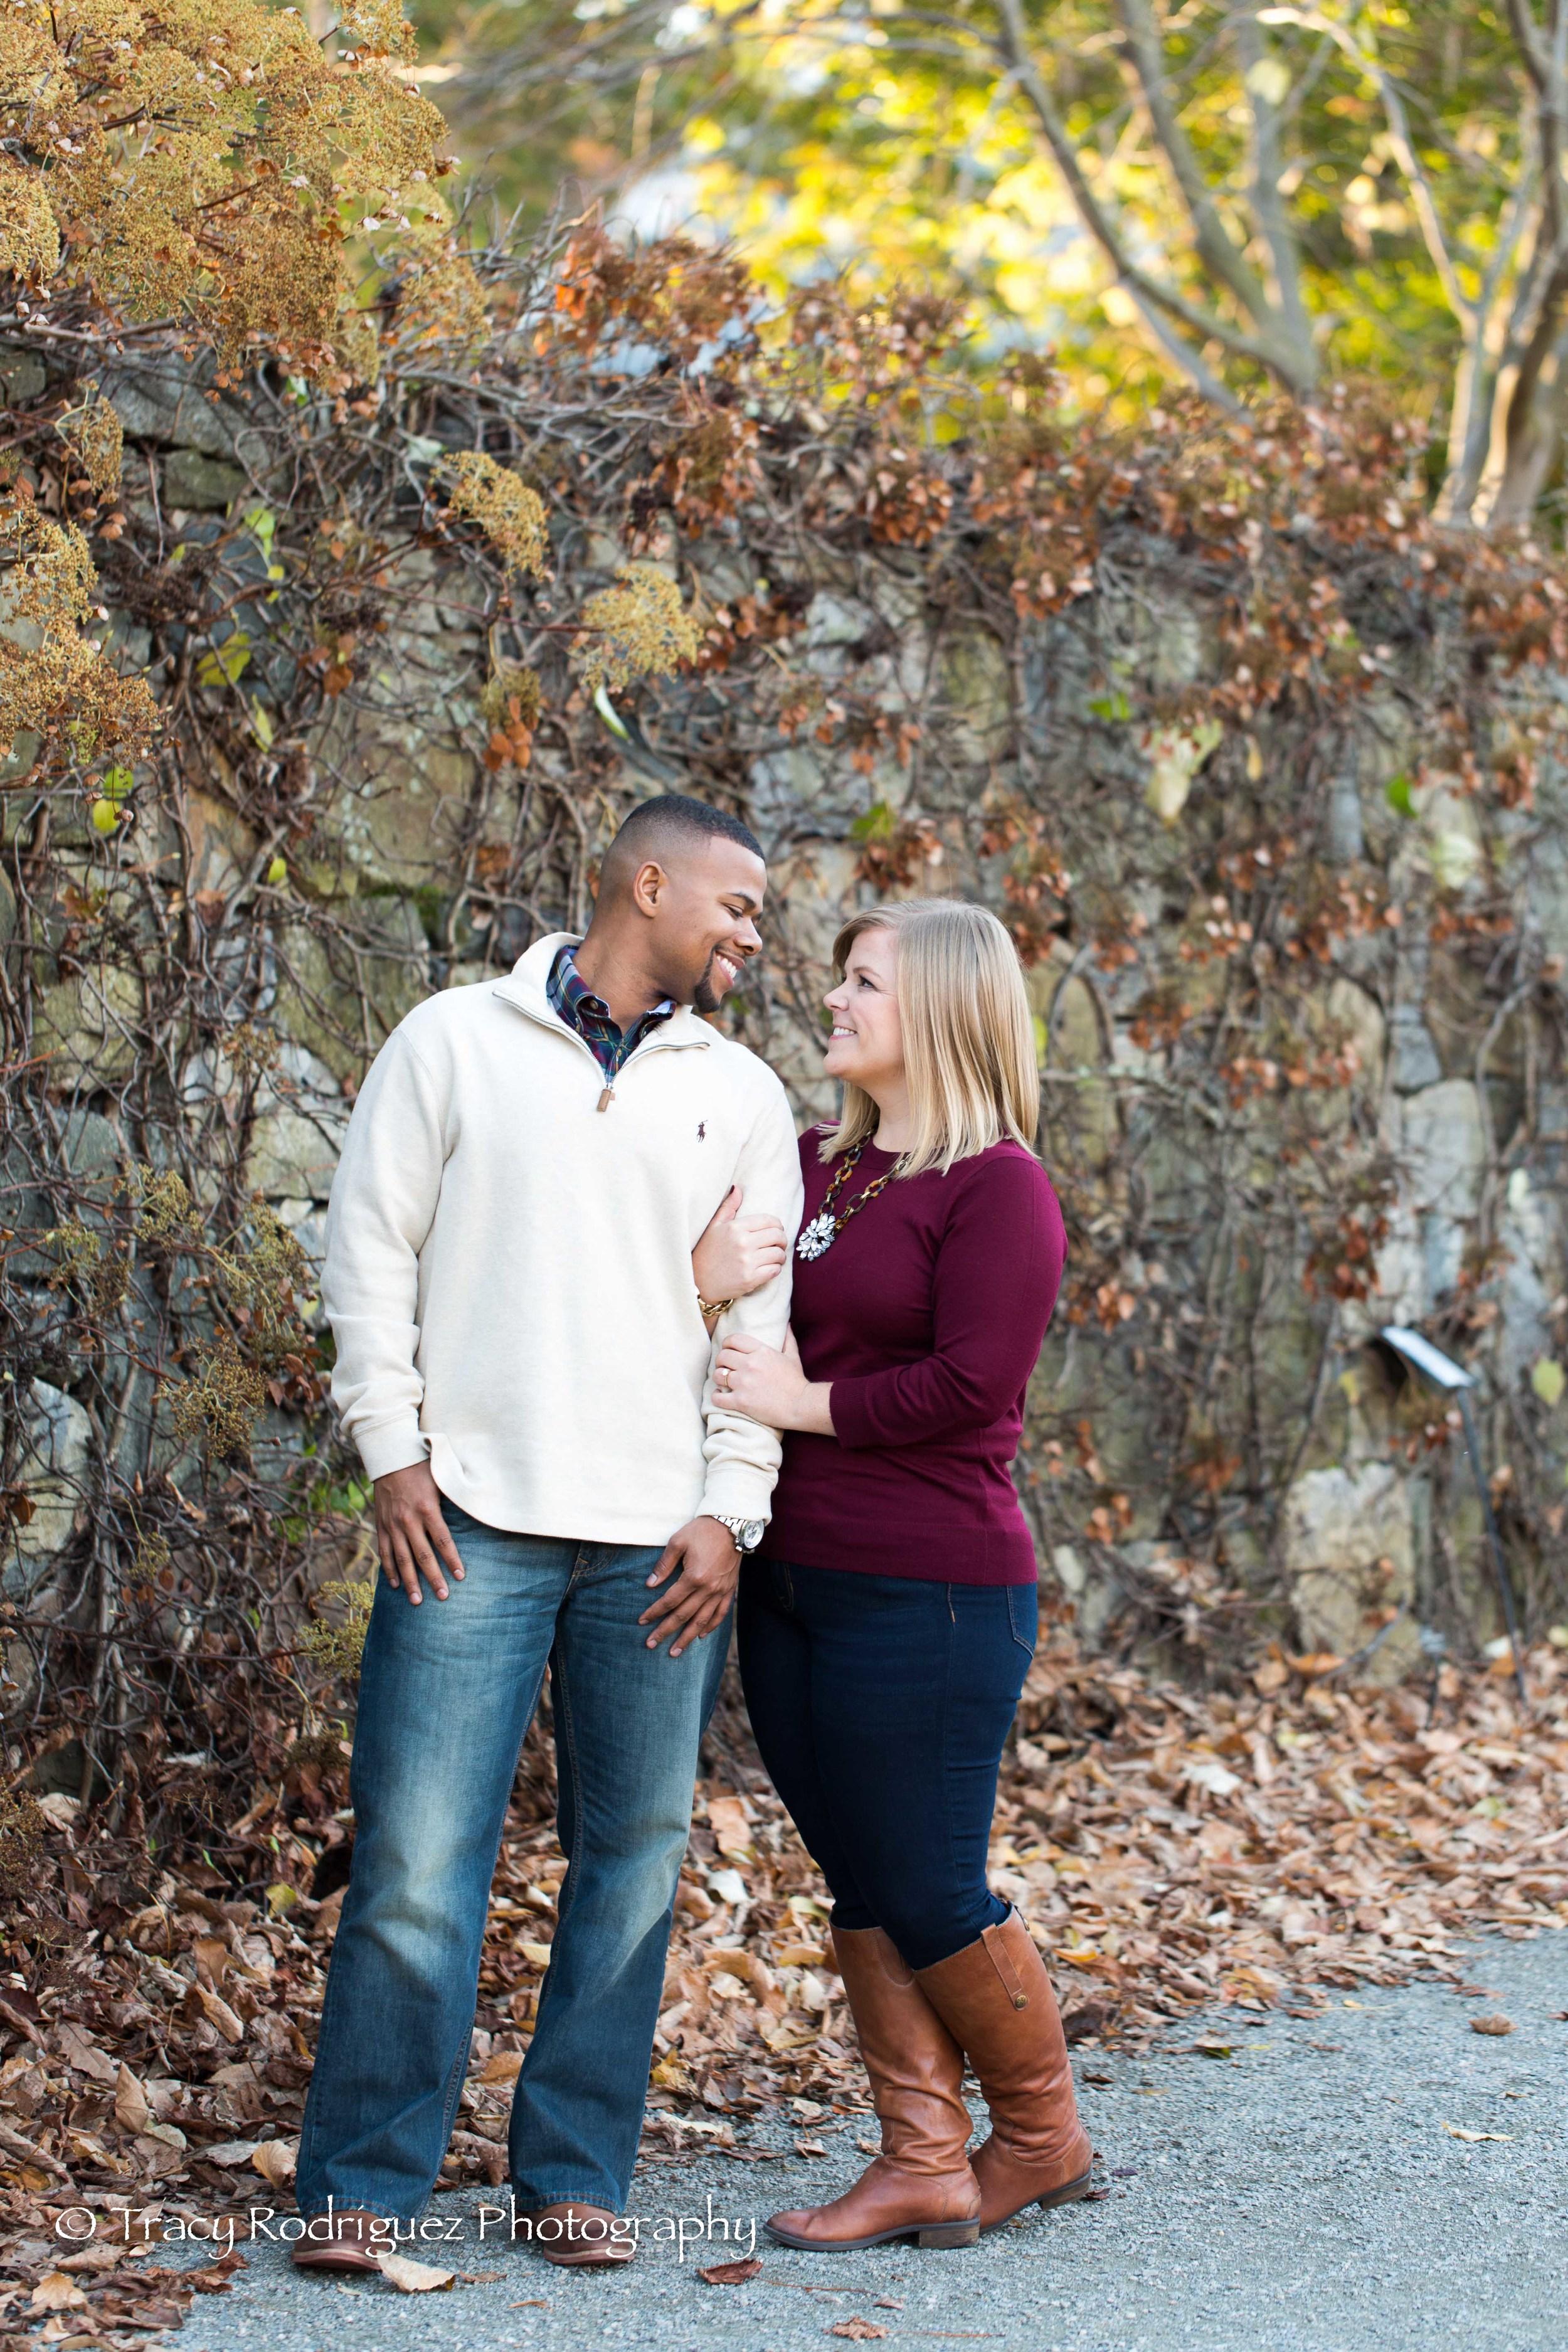 THR-Engagement-AshleyLeBron-9.jpg